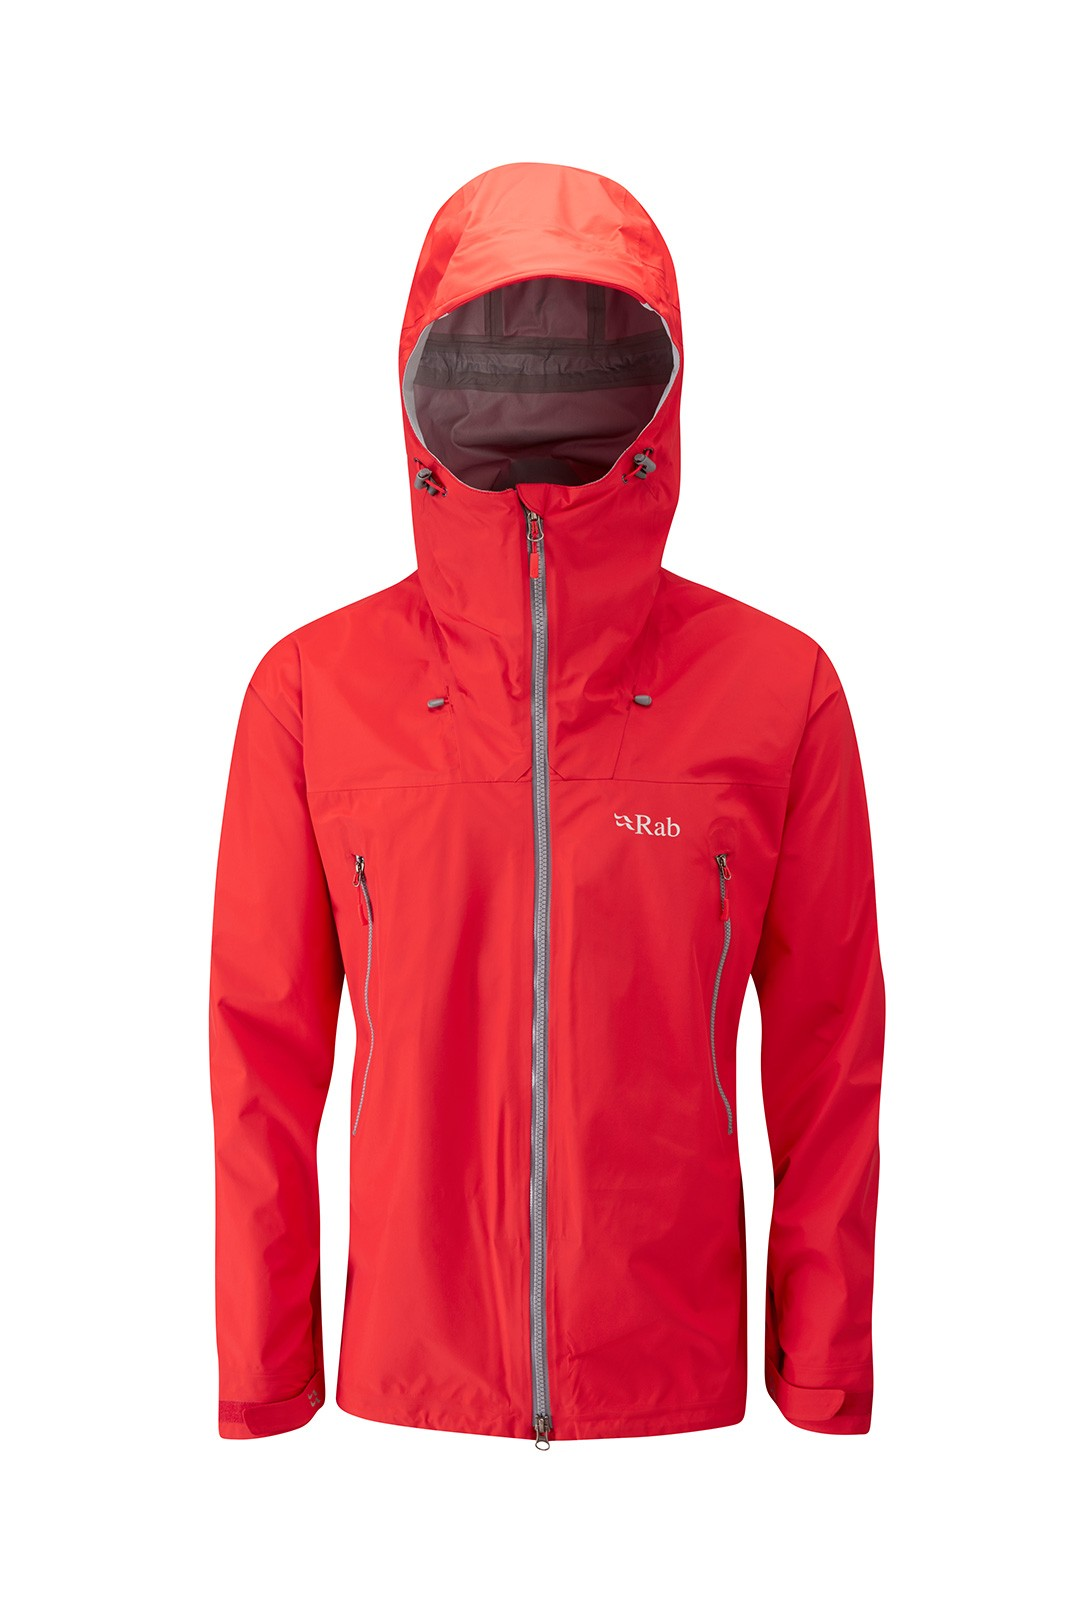 Rab Latok Alpine Jacket - ricochet